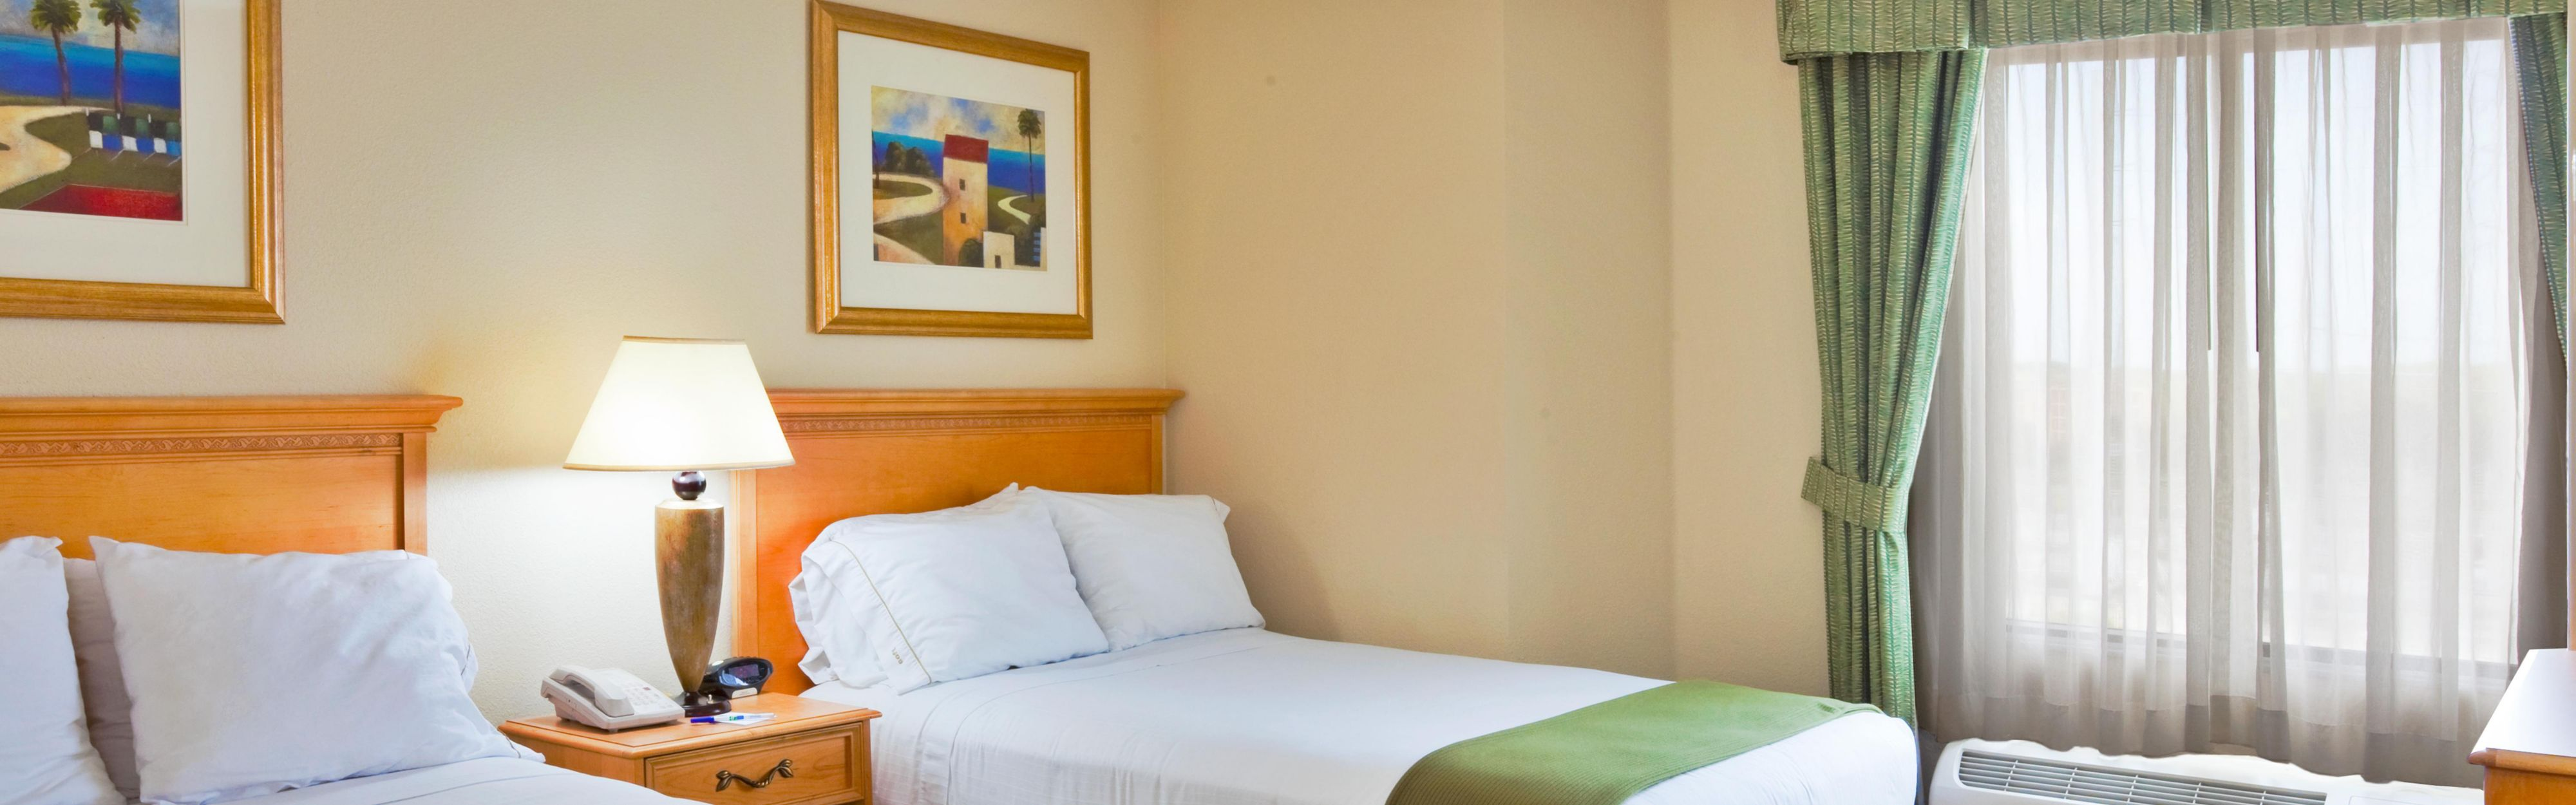 Holiday Inn Express & Suites Nearest Universal Orlando image 1